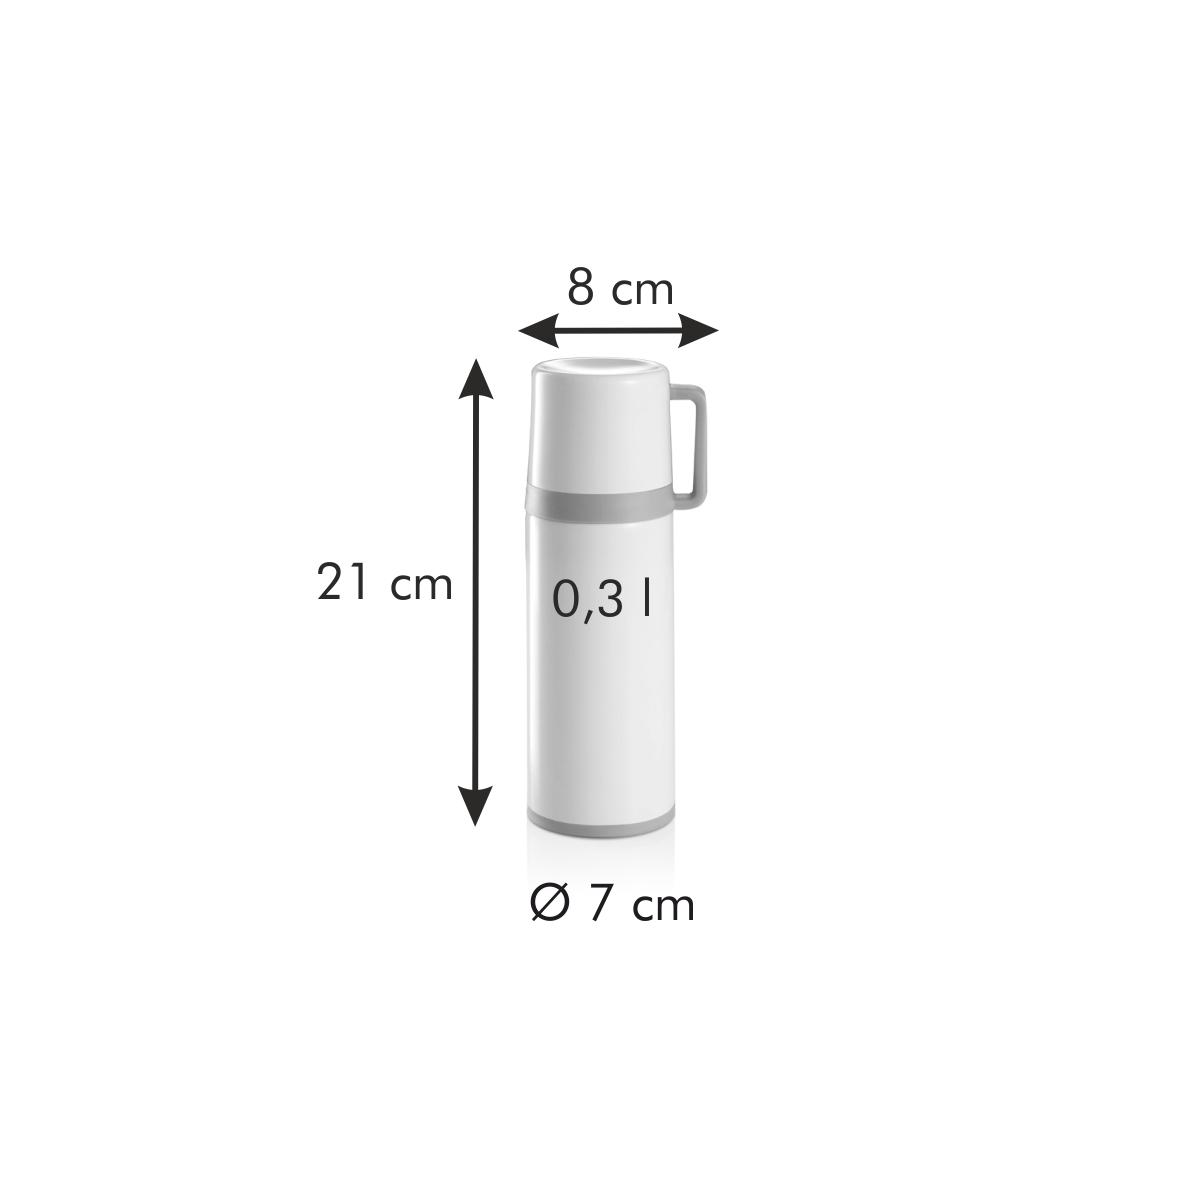 Termoska s hrníčkem CONSTANT CREAM 0,3 l, nerez